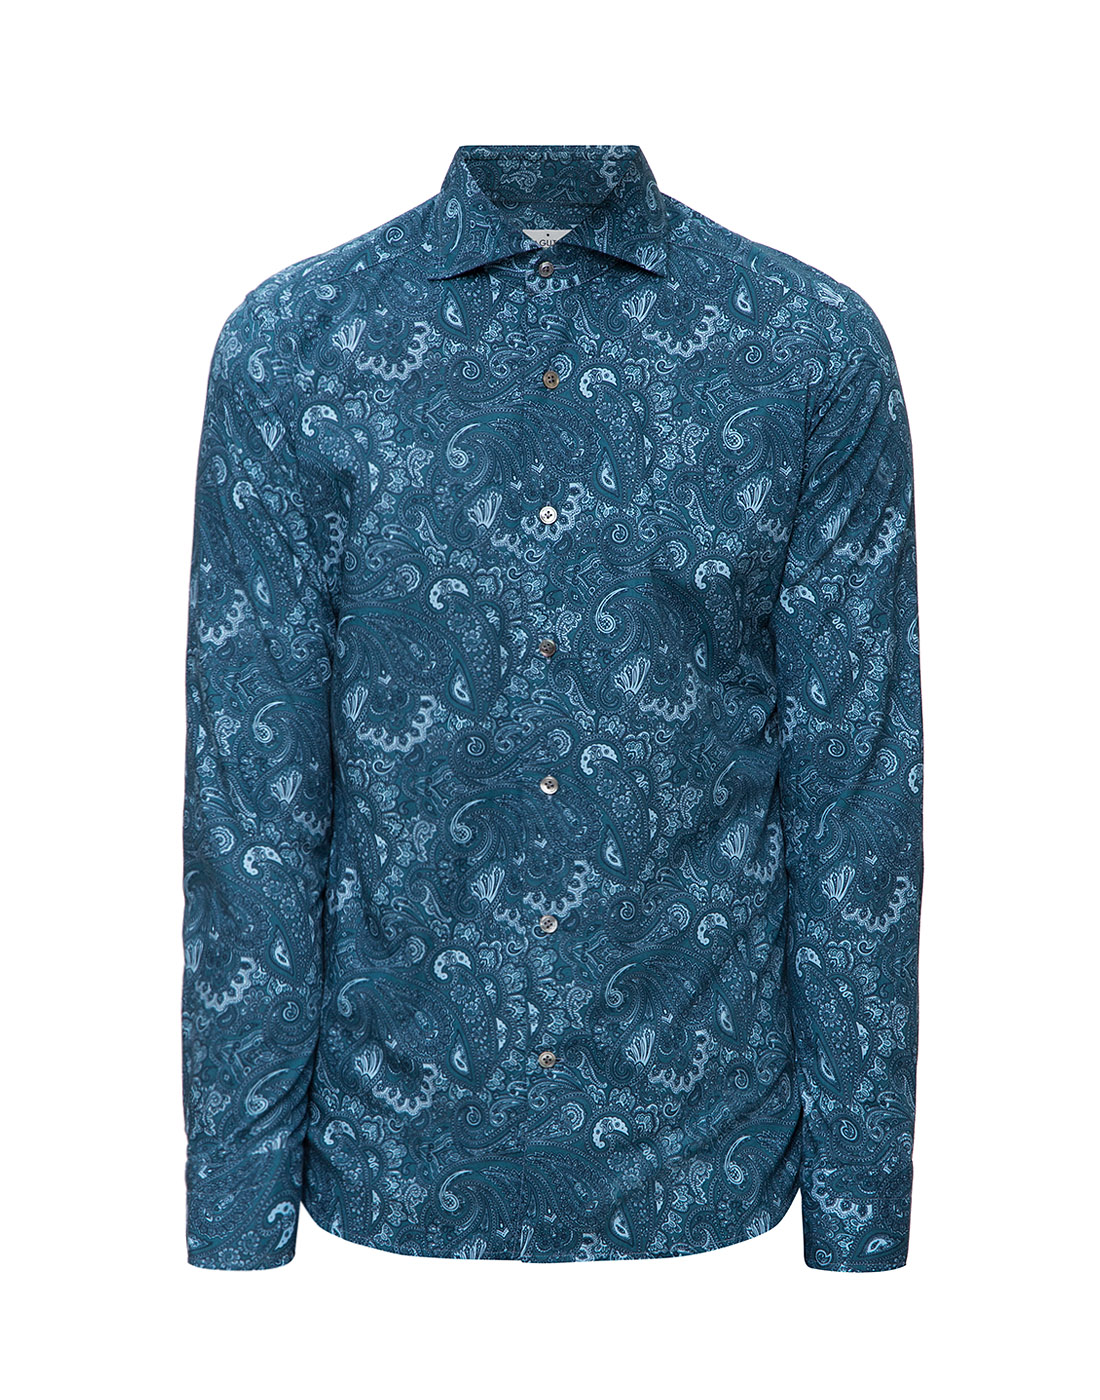 Мужская рубашка бирюзового цвета Bagutta S09715.650-1